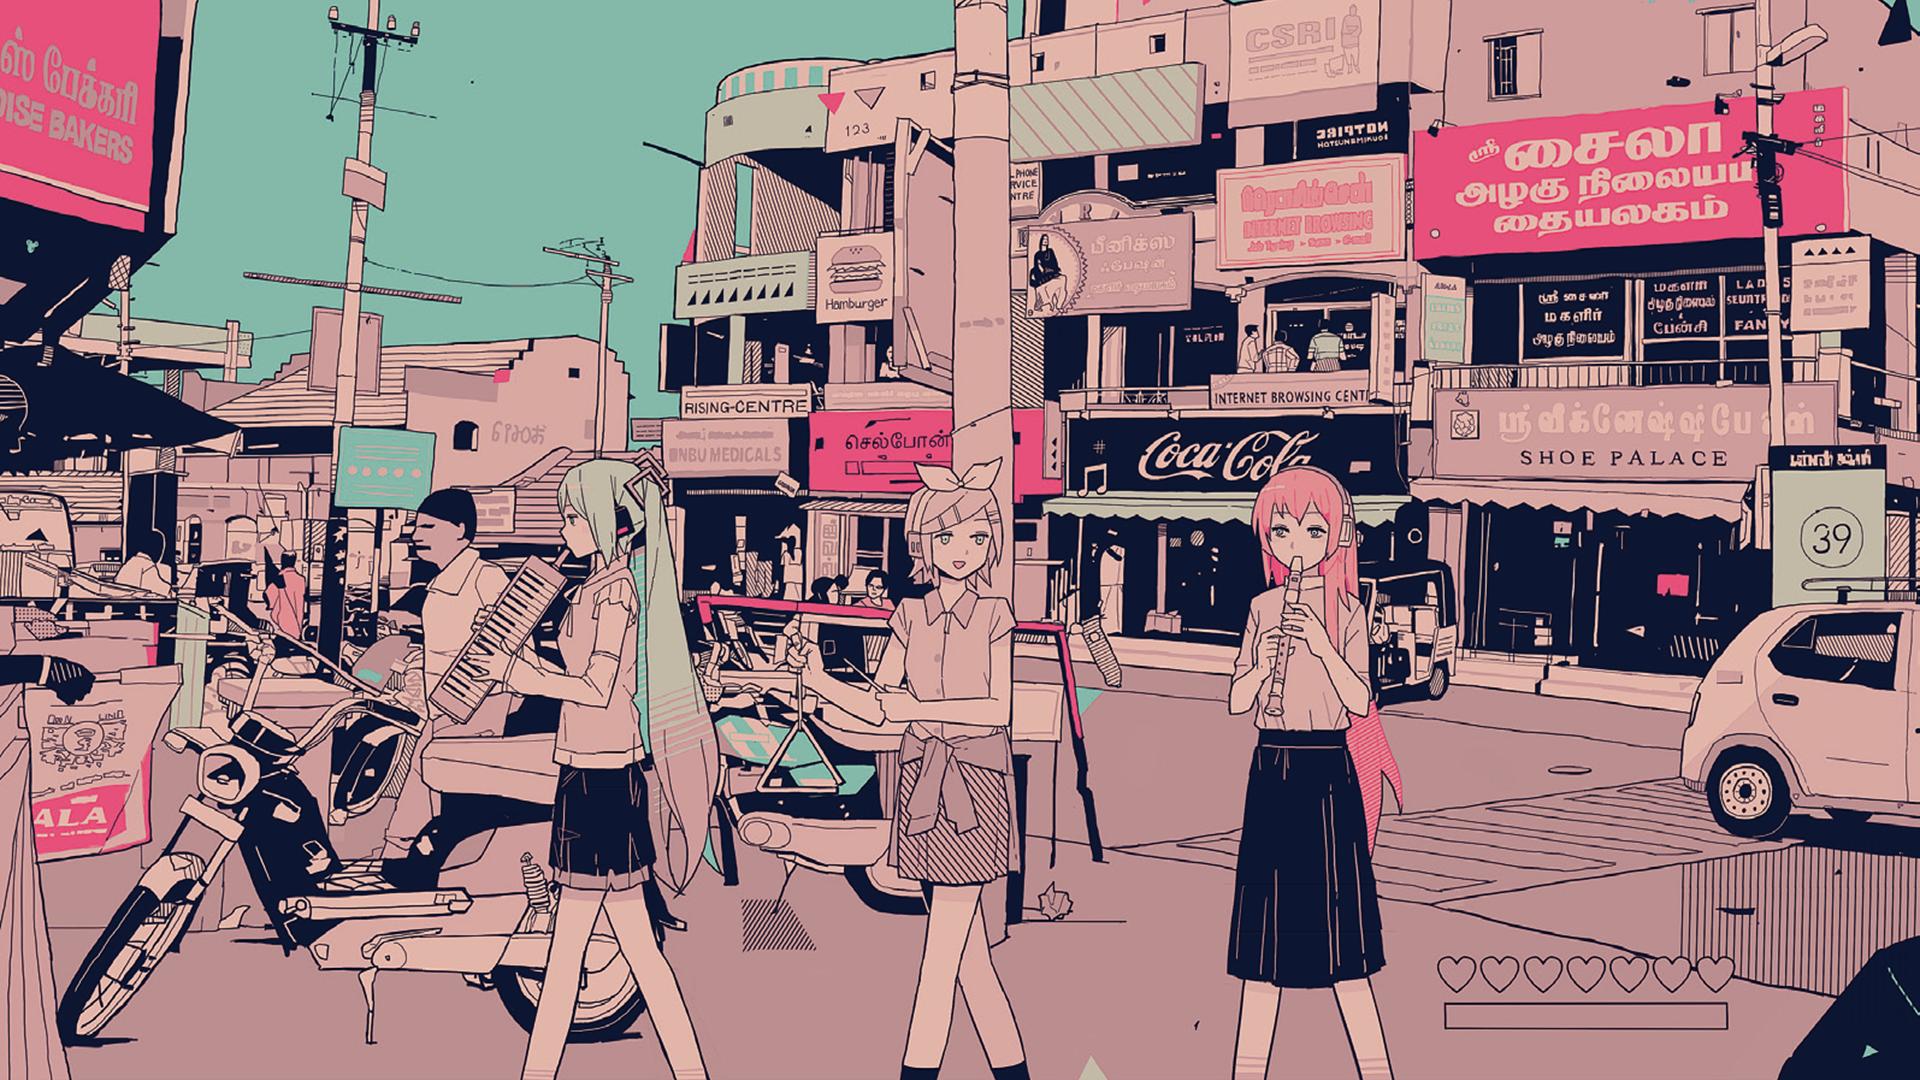 Anime 1920x1080 anime pink Vocaloid Hatsune Miku anime girls Megurine Luka vintage Kagamine Rin